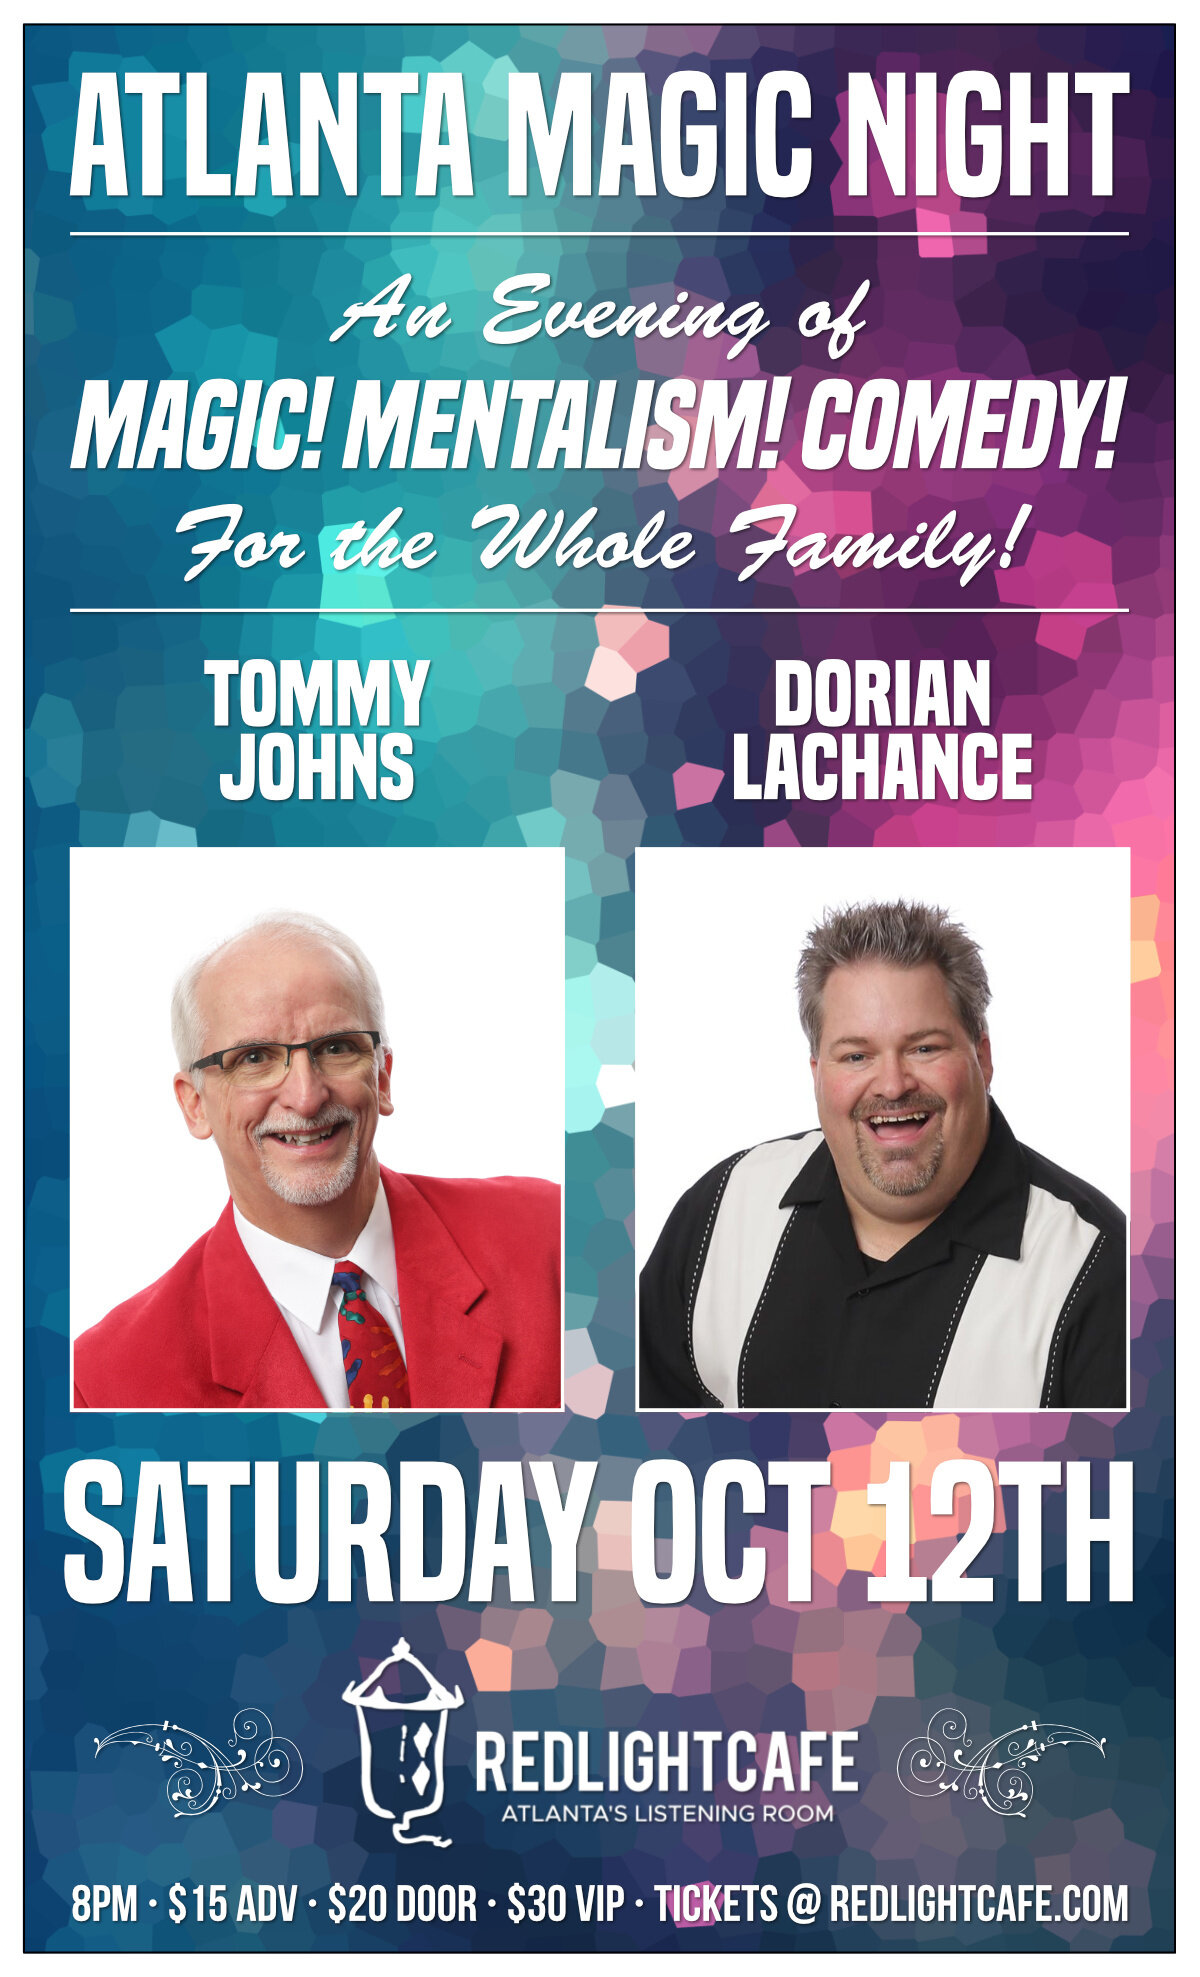 Atlanta Magic Night! w/ Tommy Johns + Dorian LaChance — October 12, 2019 — Red Light Café, Atlanta, GA